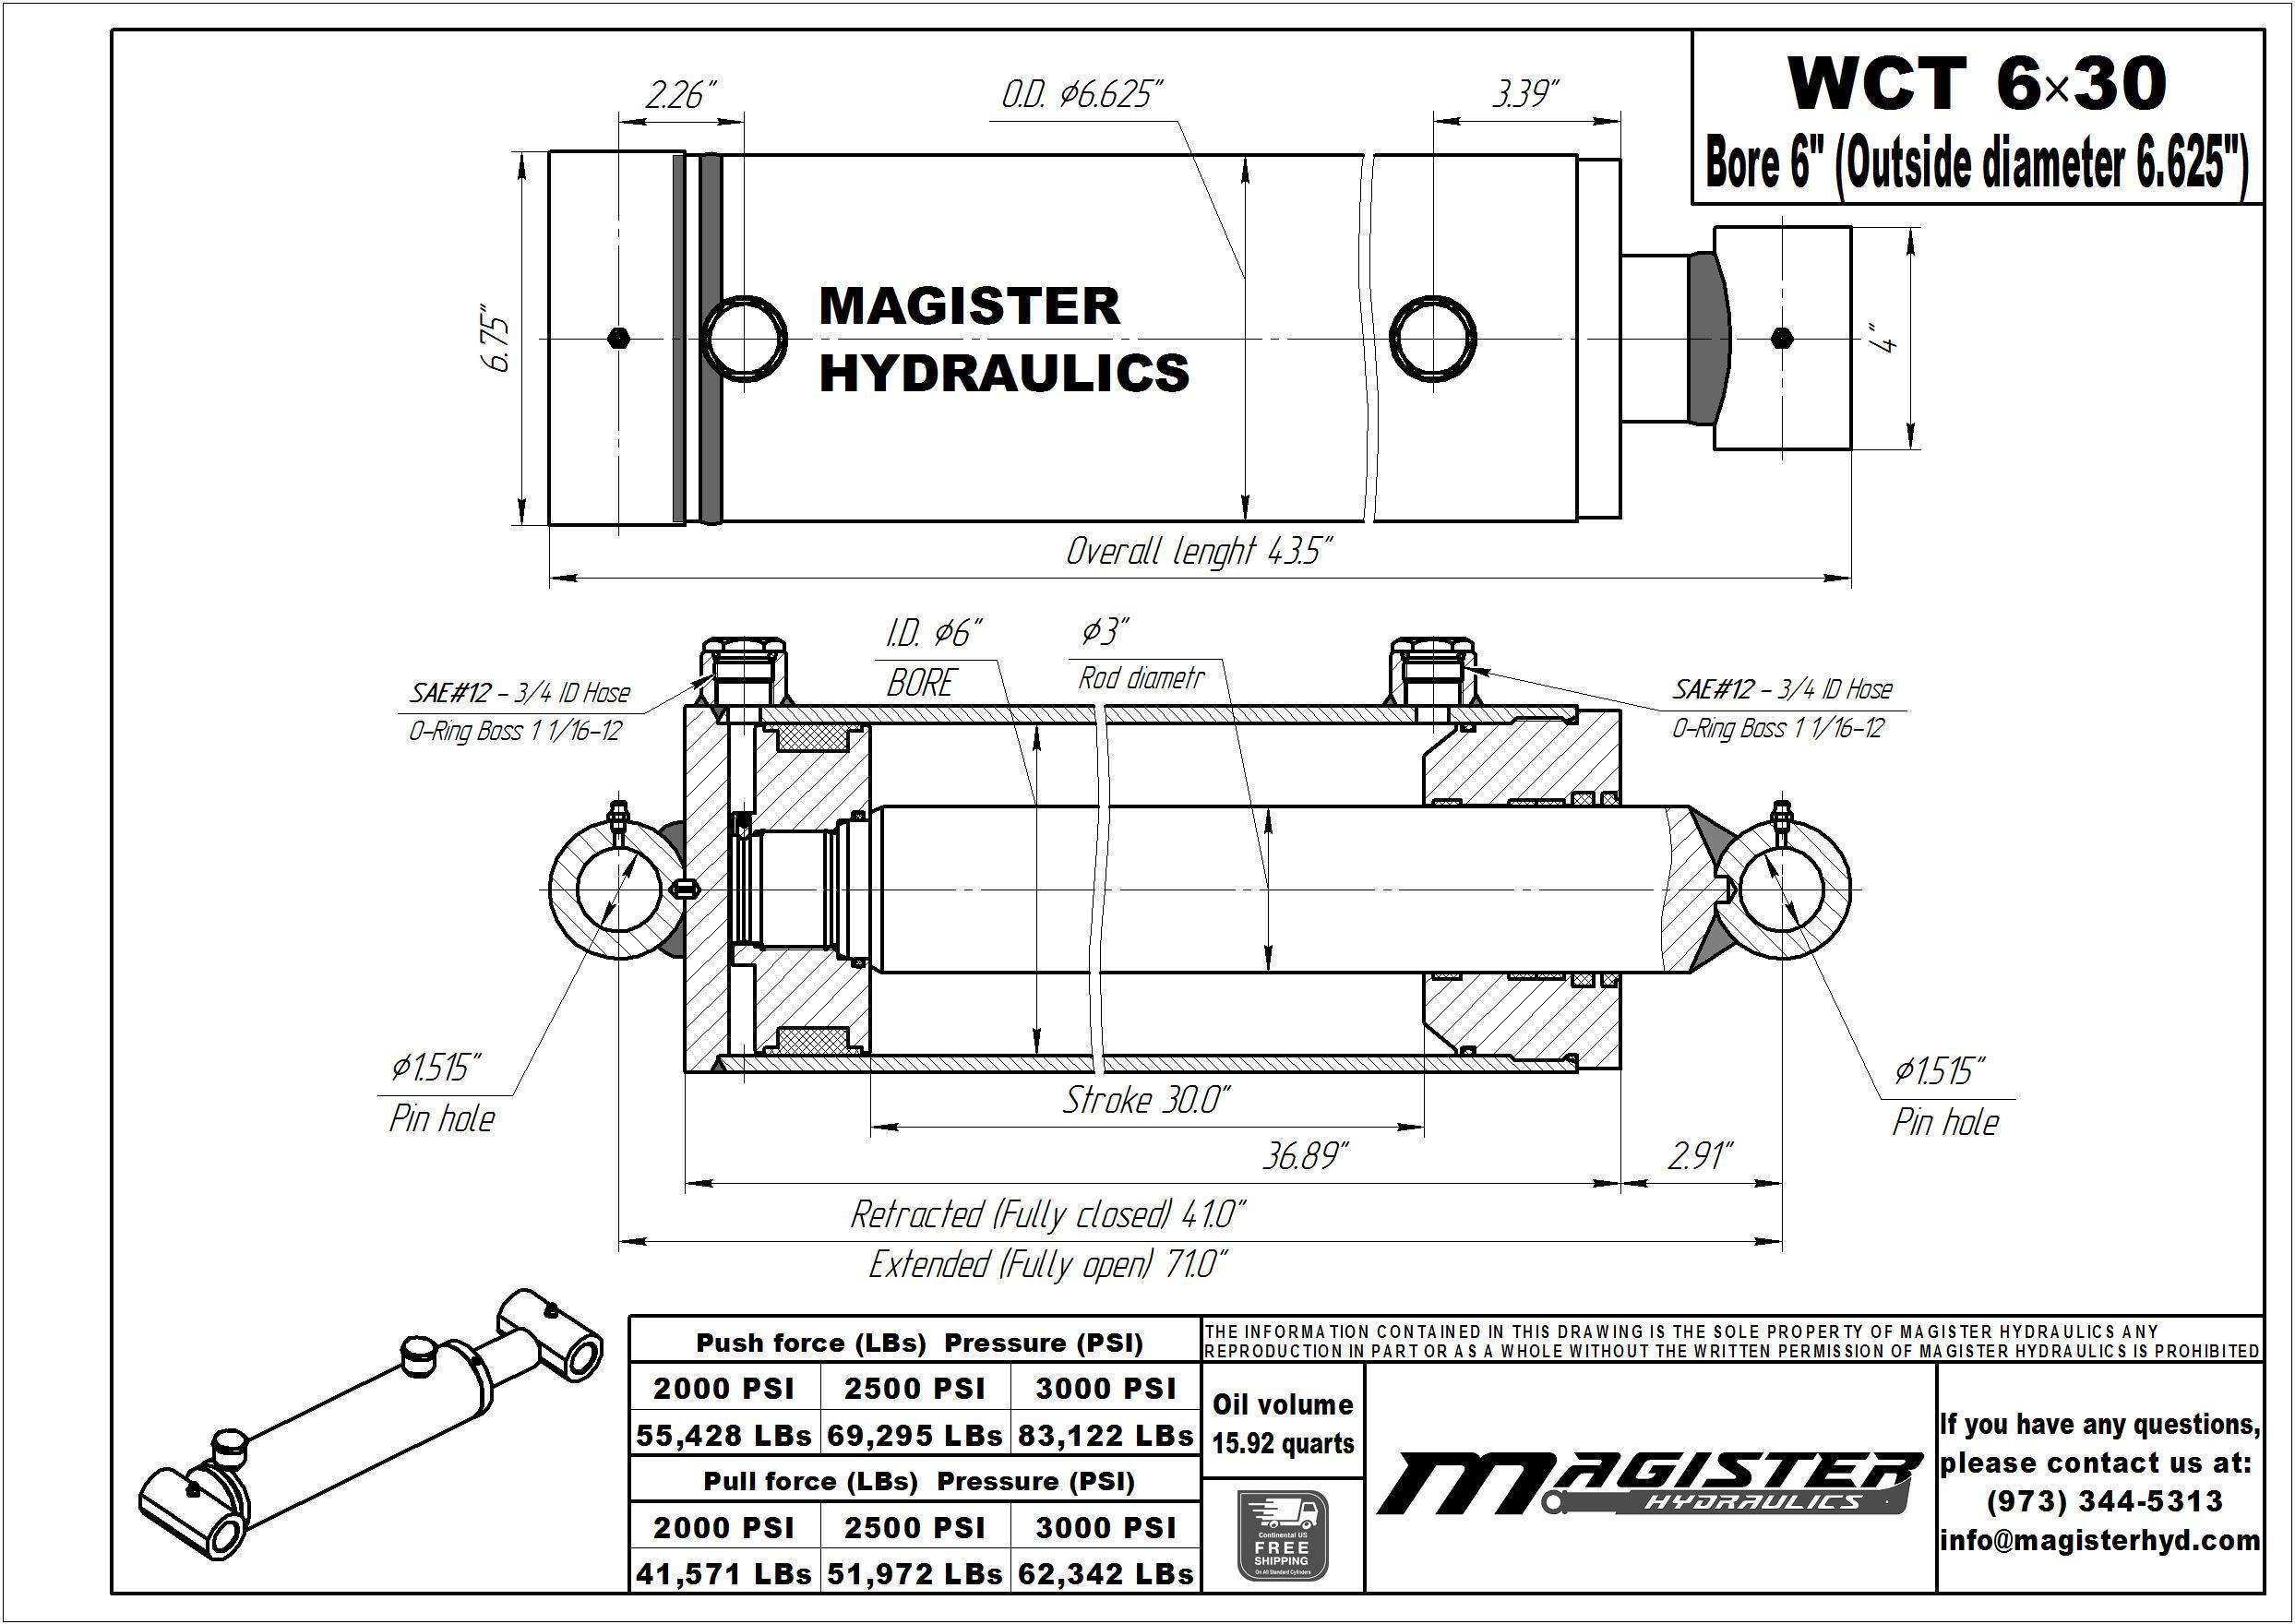 6 Bore X 30 Stroke Hydraulic Cylinder Welded Cross Tube